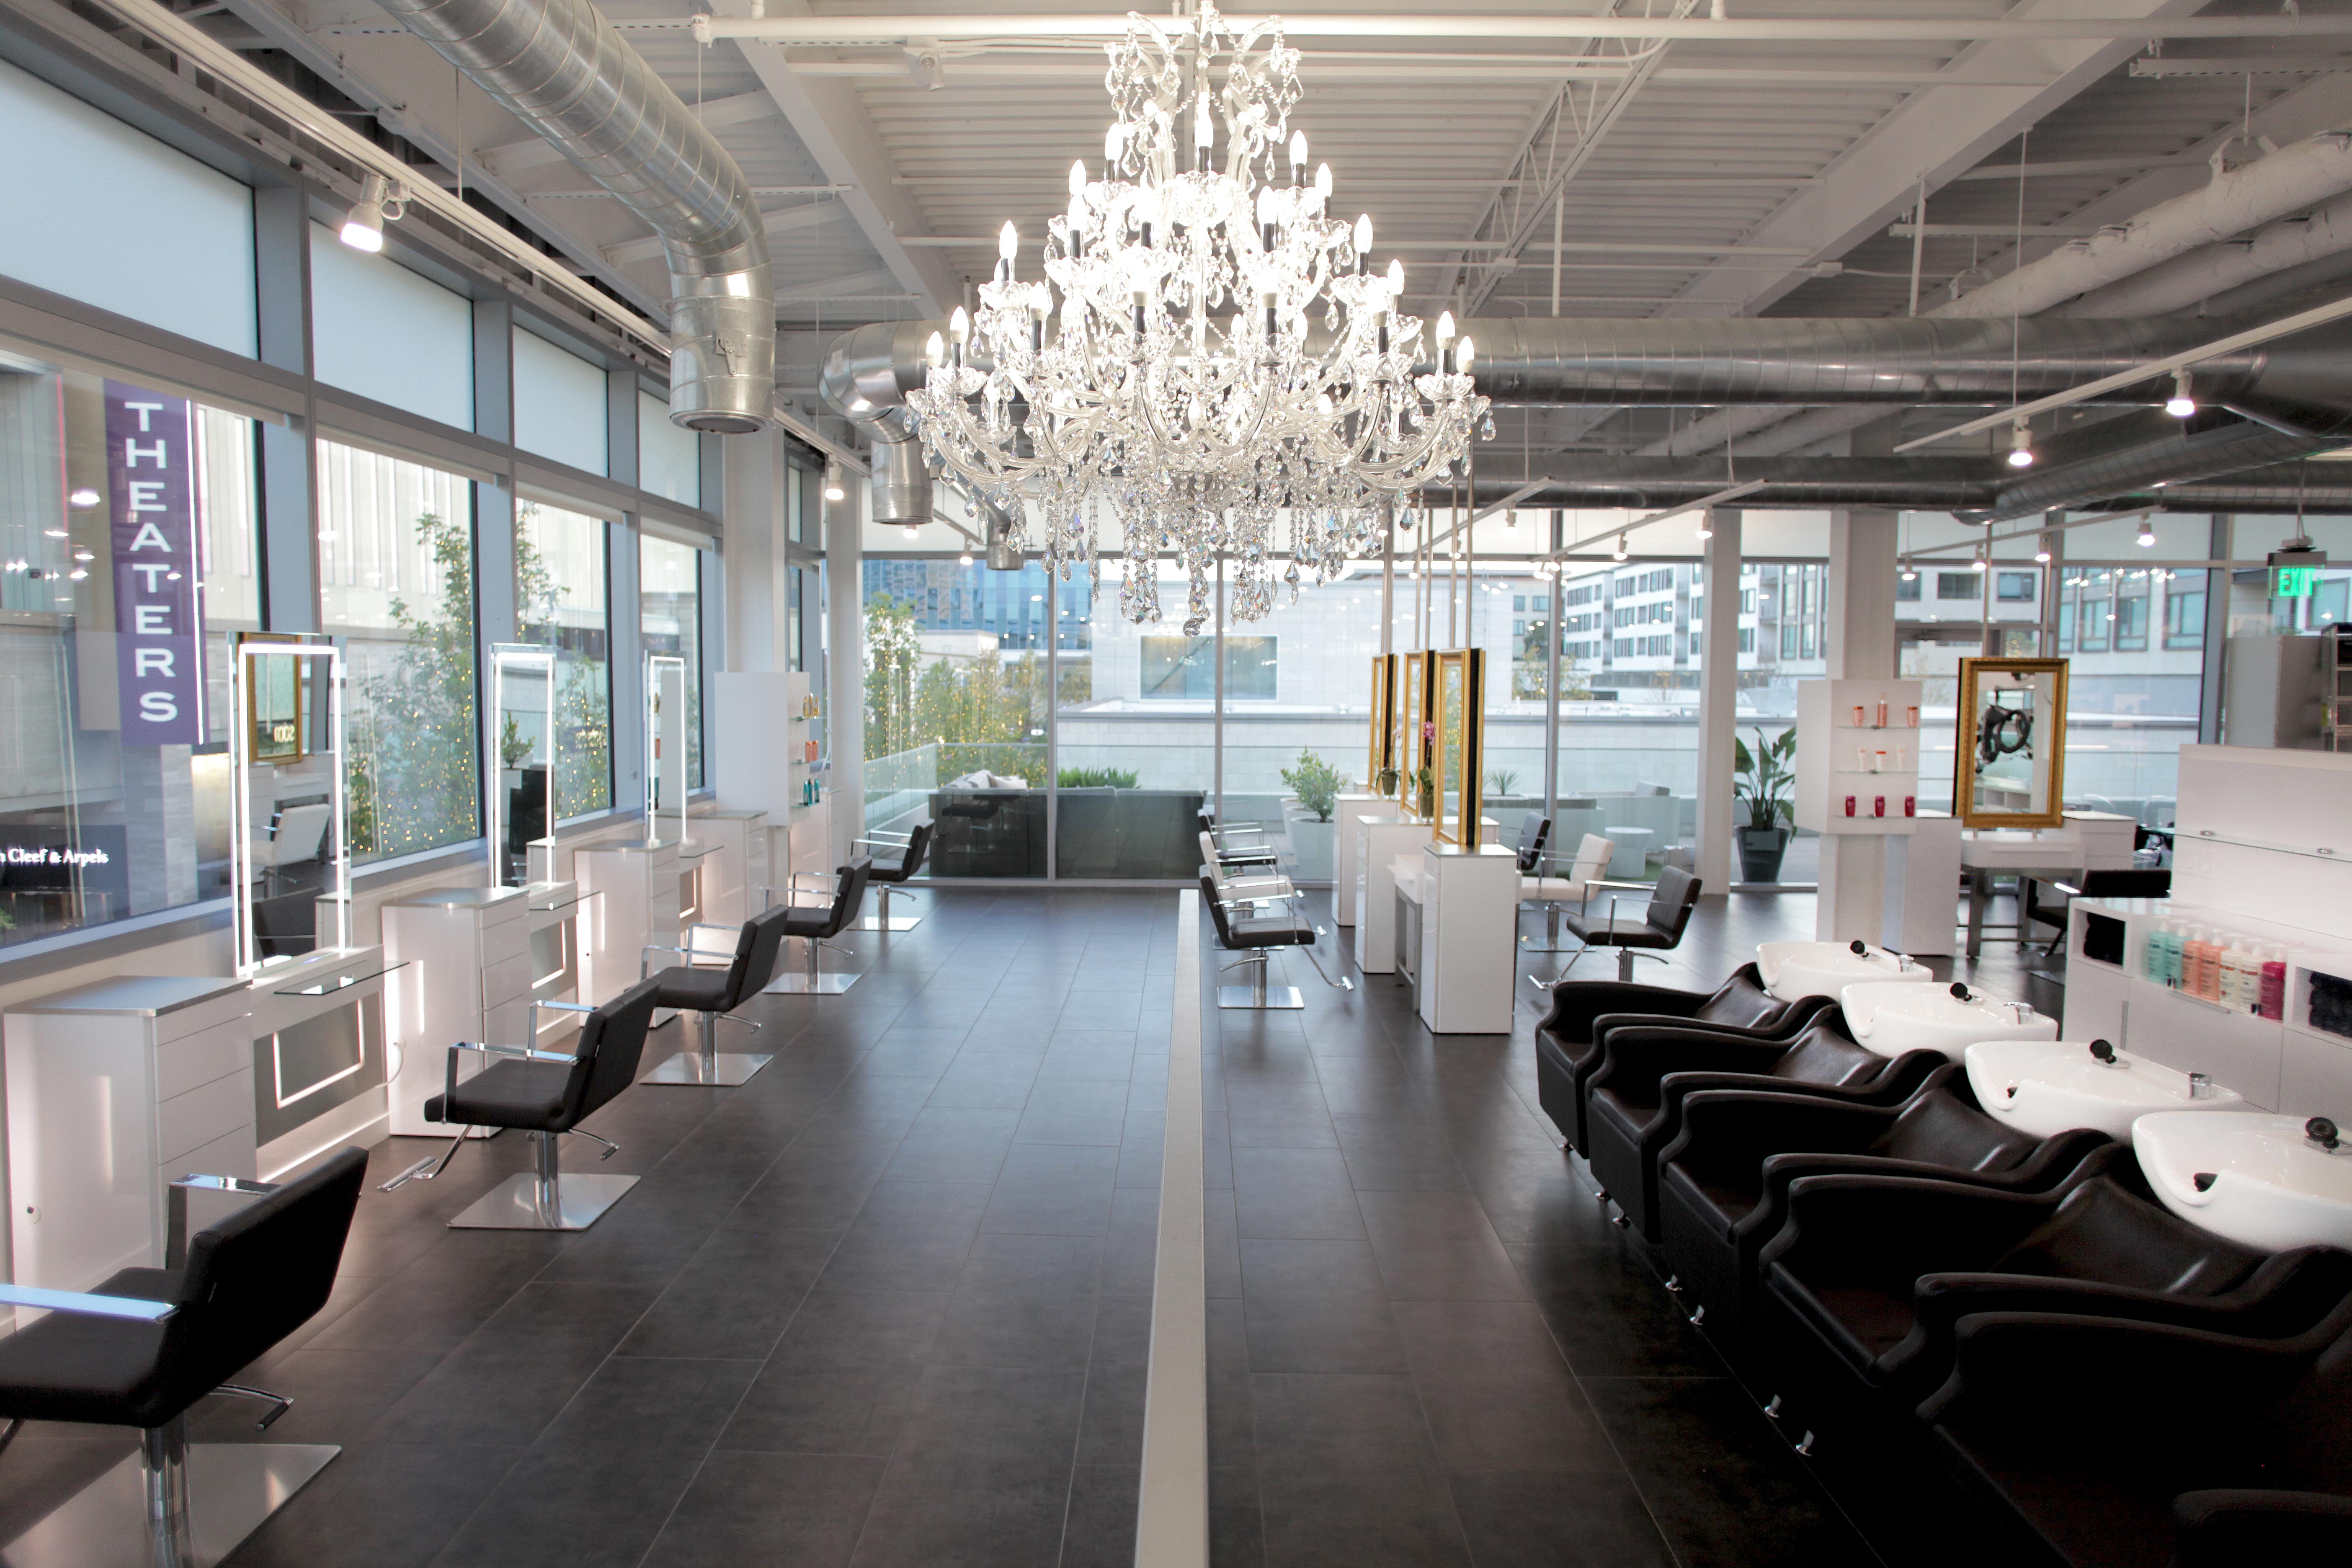 Salons of the Year 2017: Bella Rinova Salon